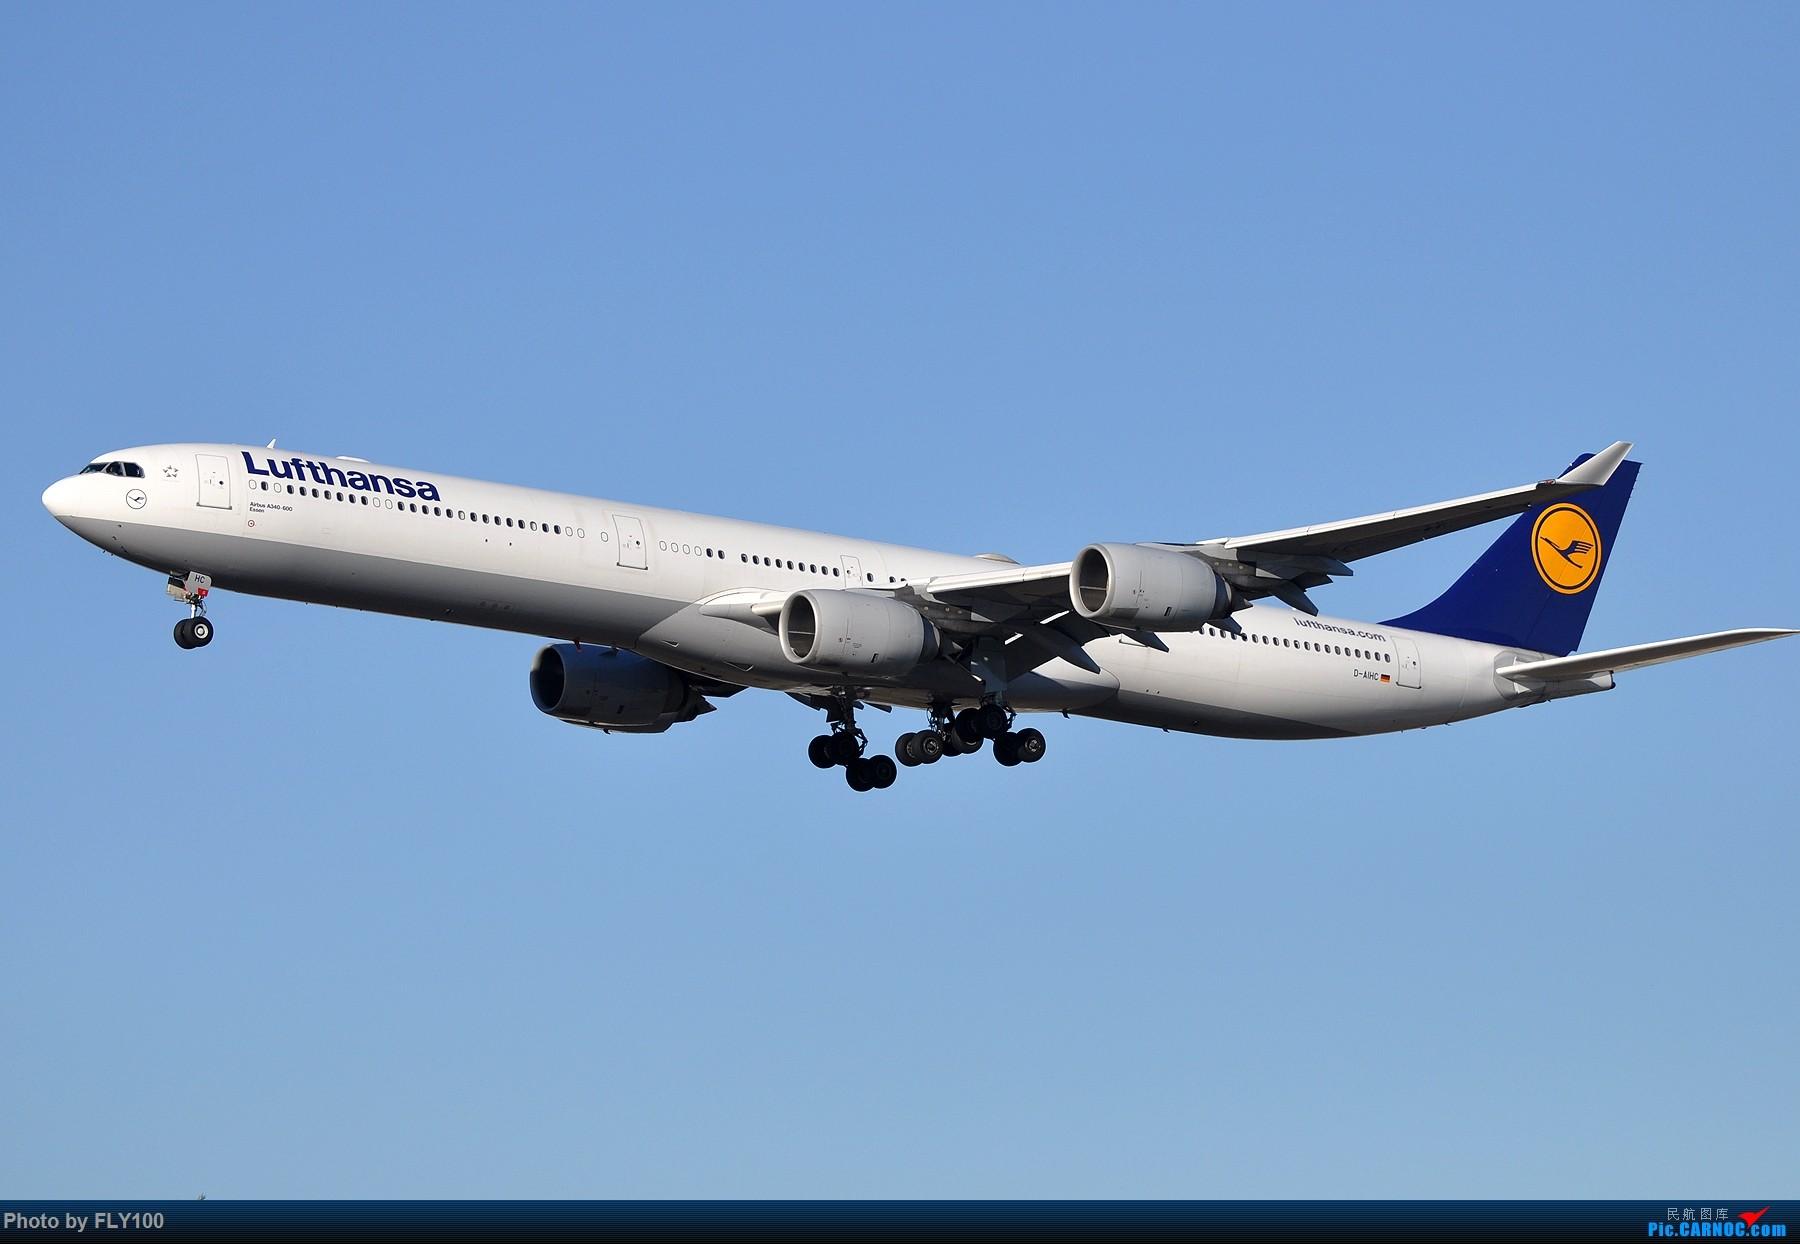 Re:[原创]【LAX】两张AIRBUS A340-600的大图,汉莎航空和维珍大西洋航空 AIRBUS A340-600 D-AIHC 美国洛杉矶机场